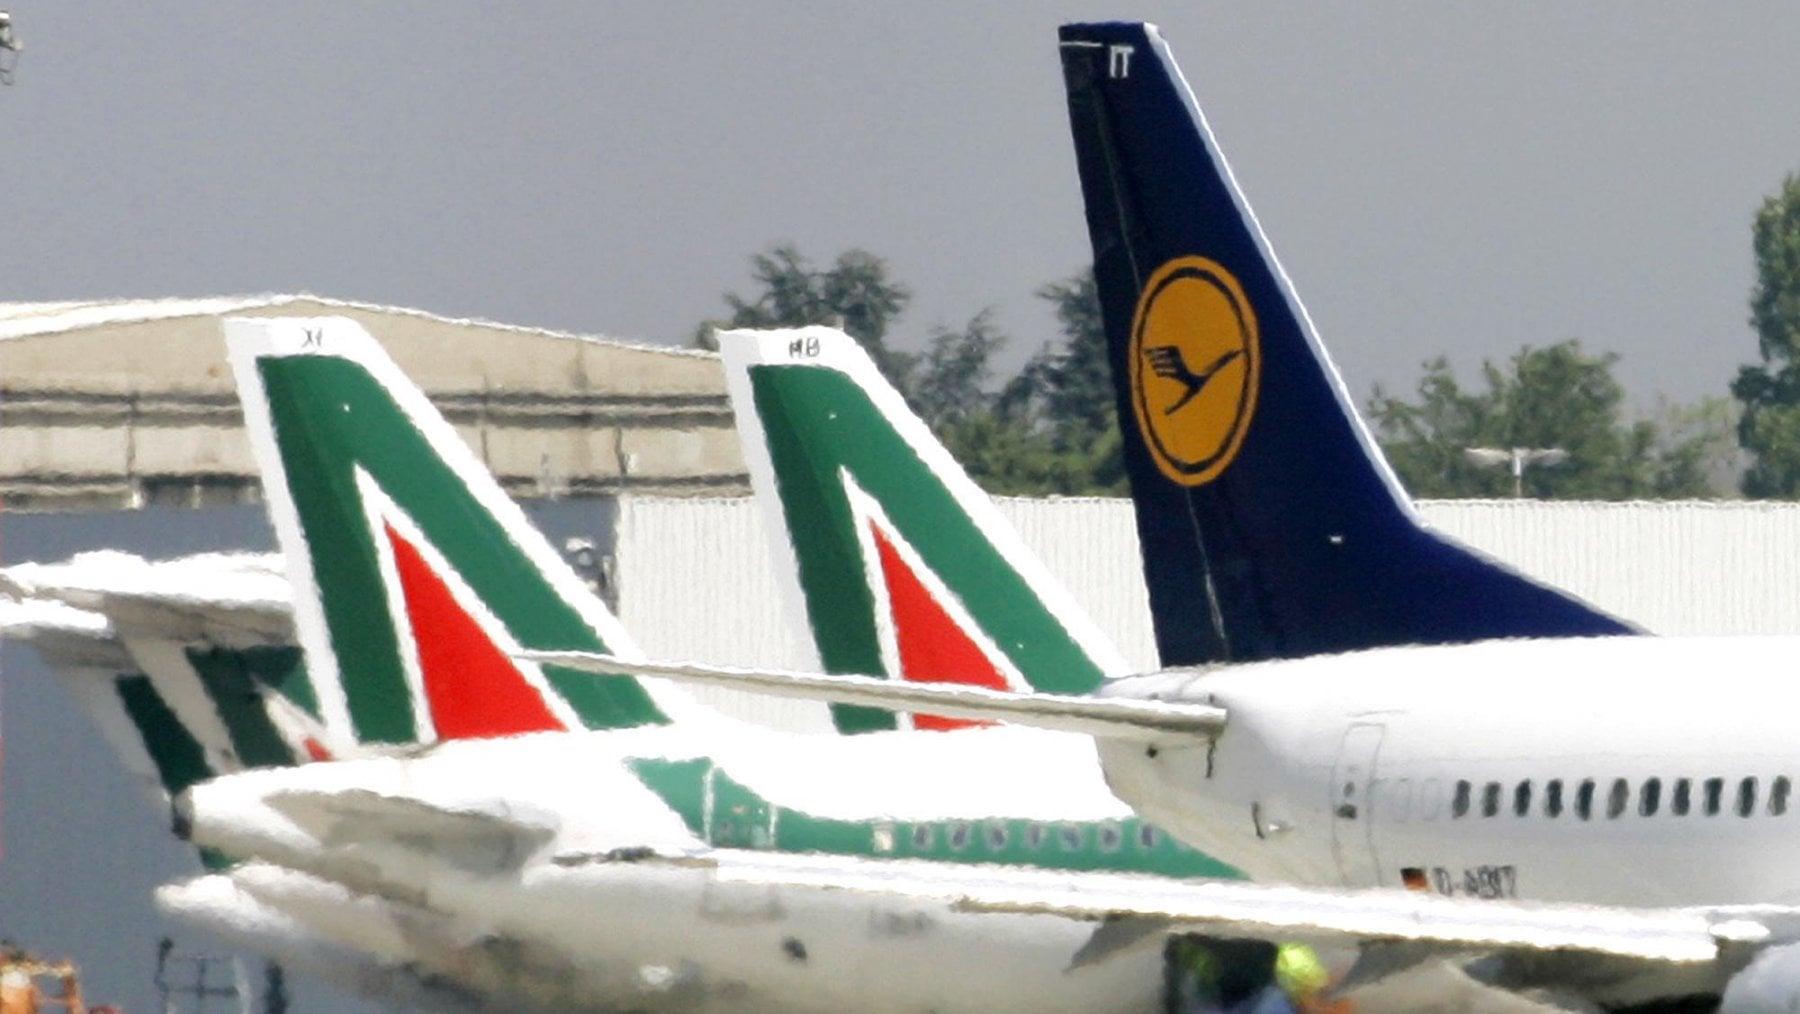 Strike in the skies on November 25th, Alitalia cancels 137 flights, Unravel Malta